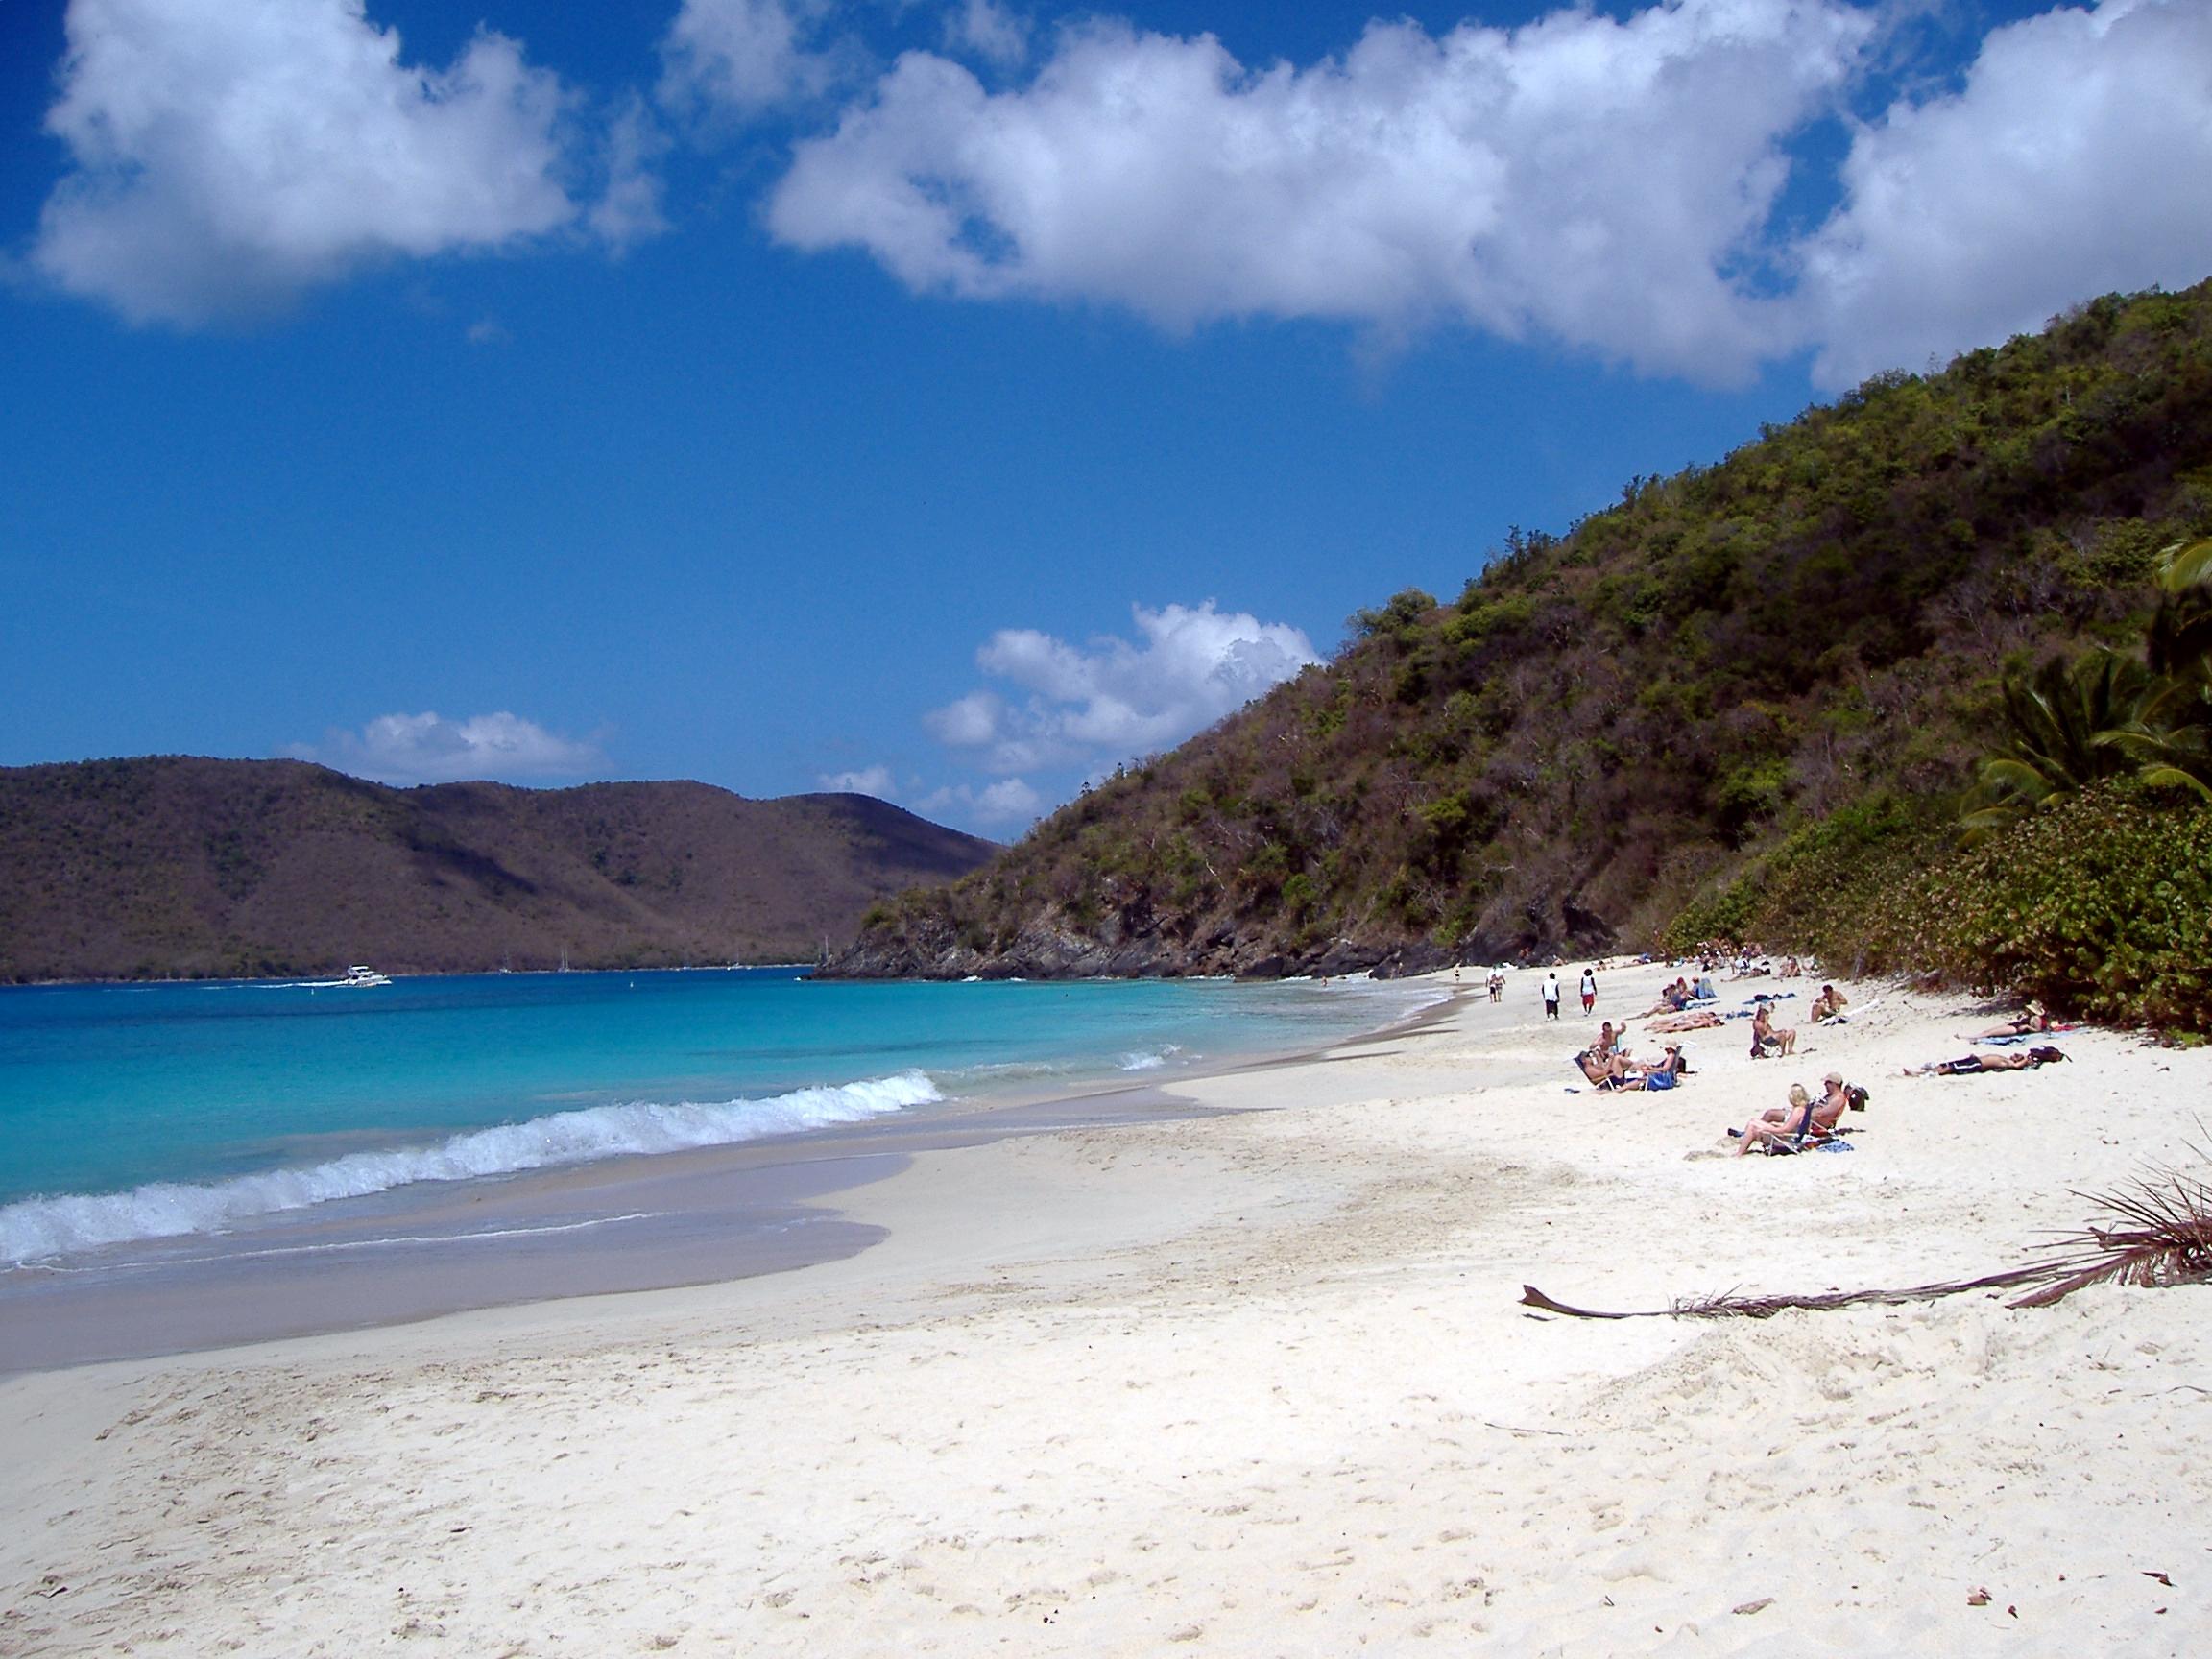 Island Campground Resort